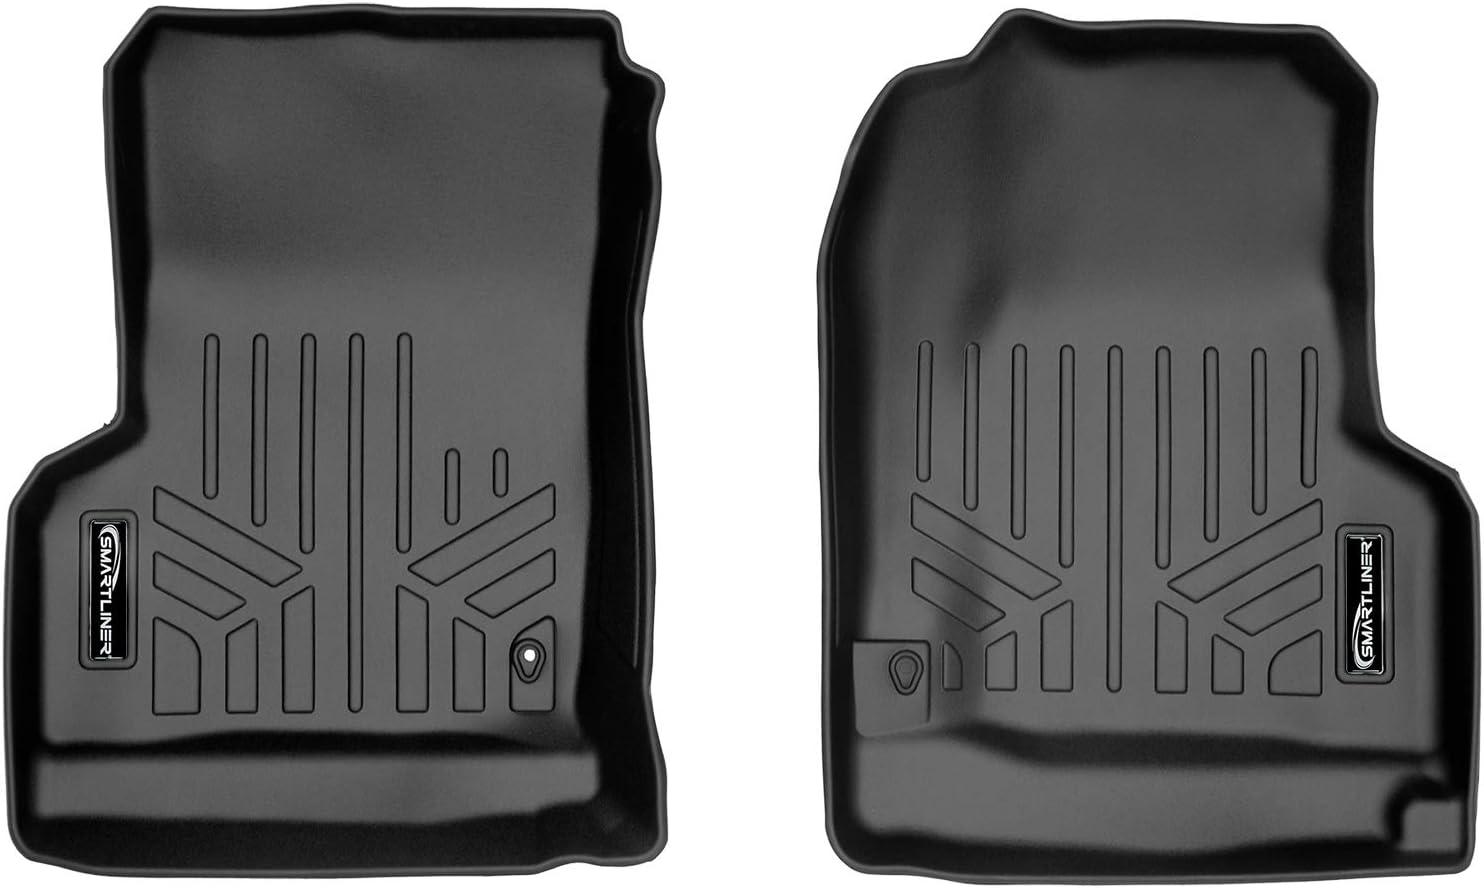 MAXLINER Floor Mats 1st Row Liner Set Black for 1997-2006 Jeep Wrangler Unlimited and 2 Door Models